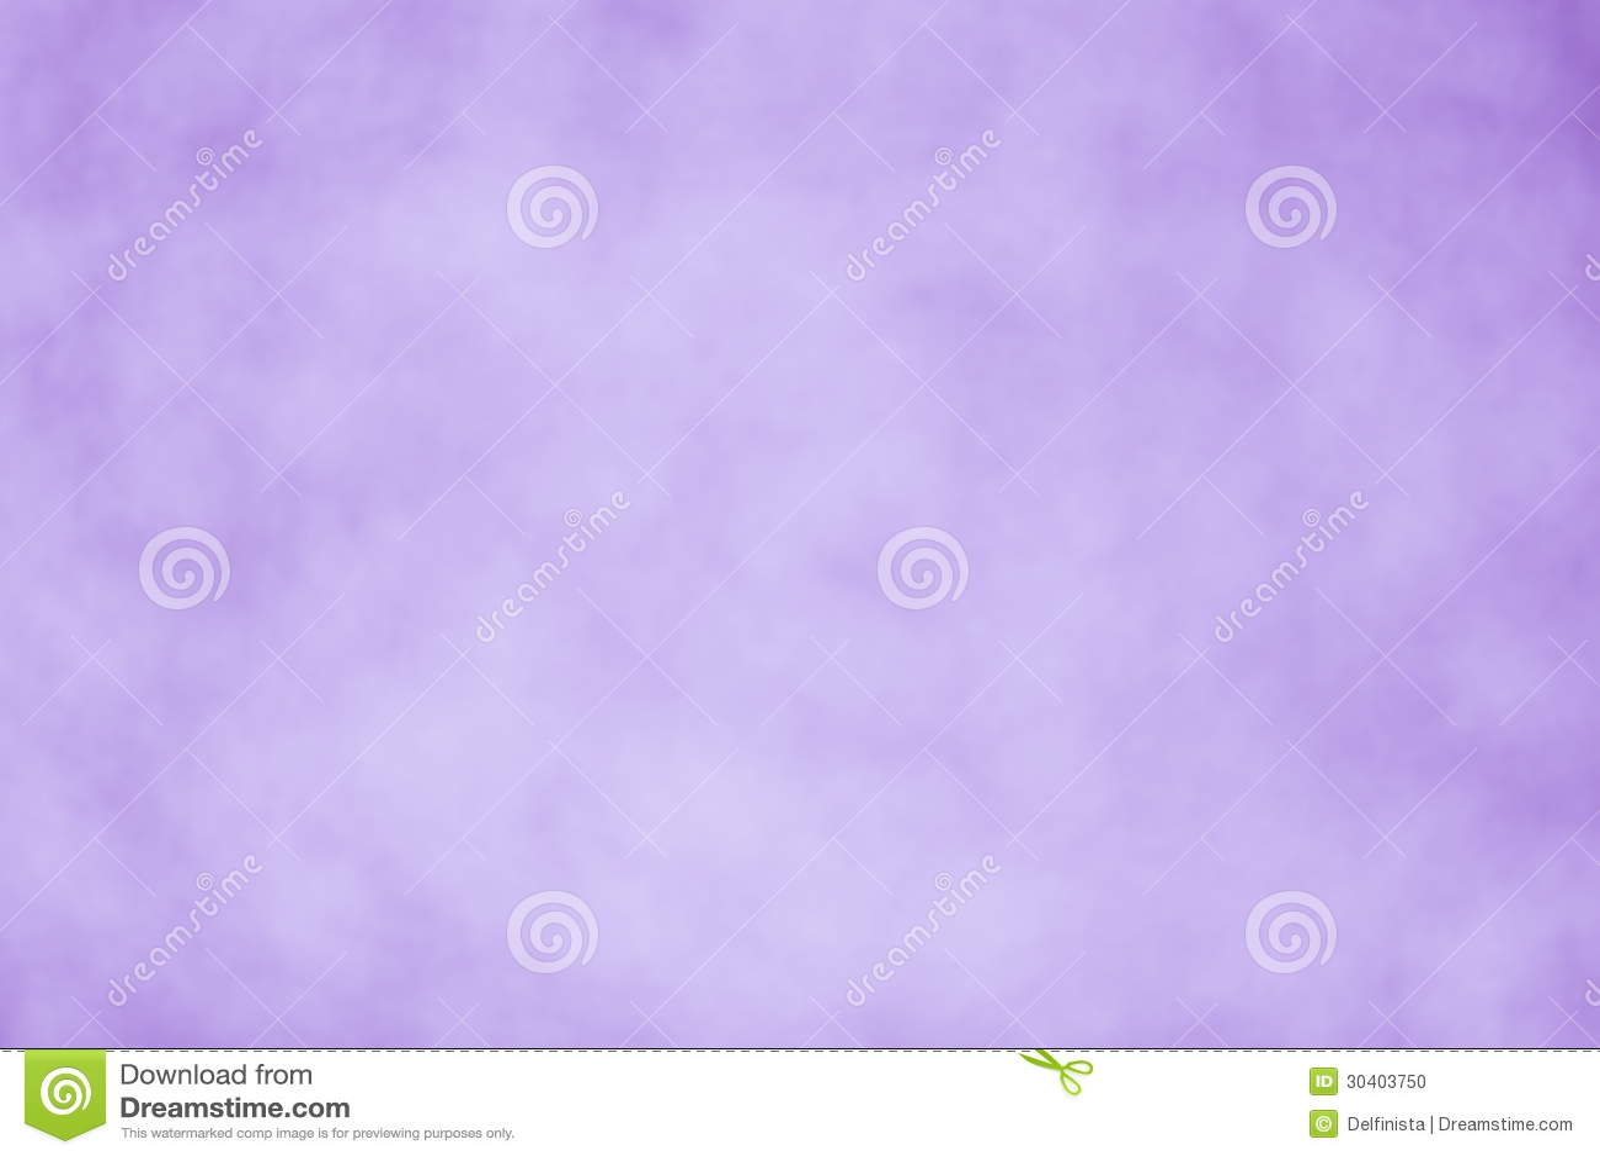 Purple Blurred Background Wallpaper Stock Photo Stock